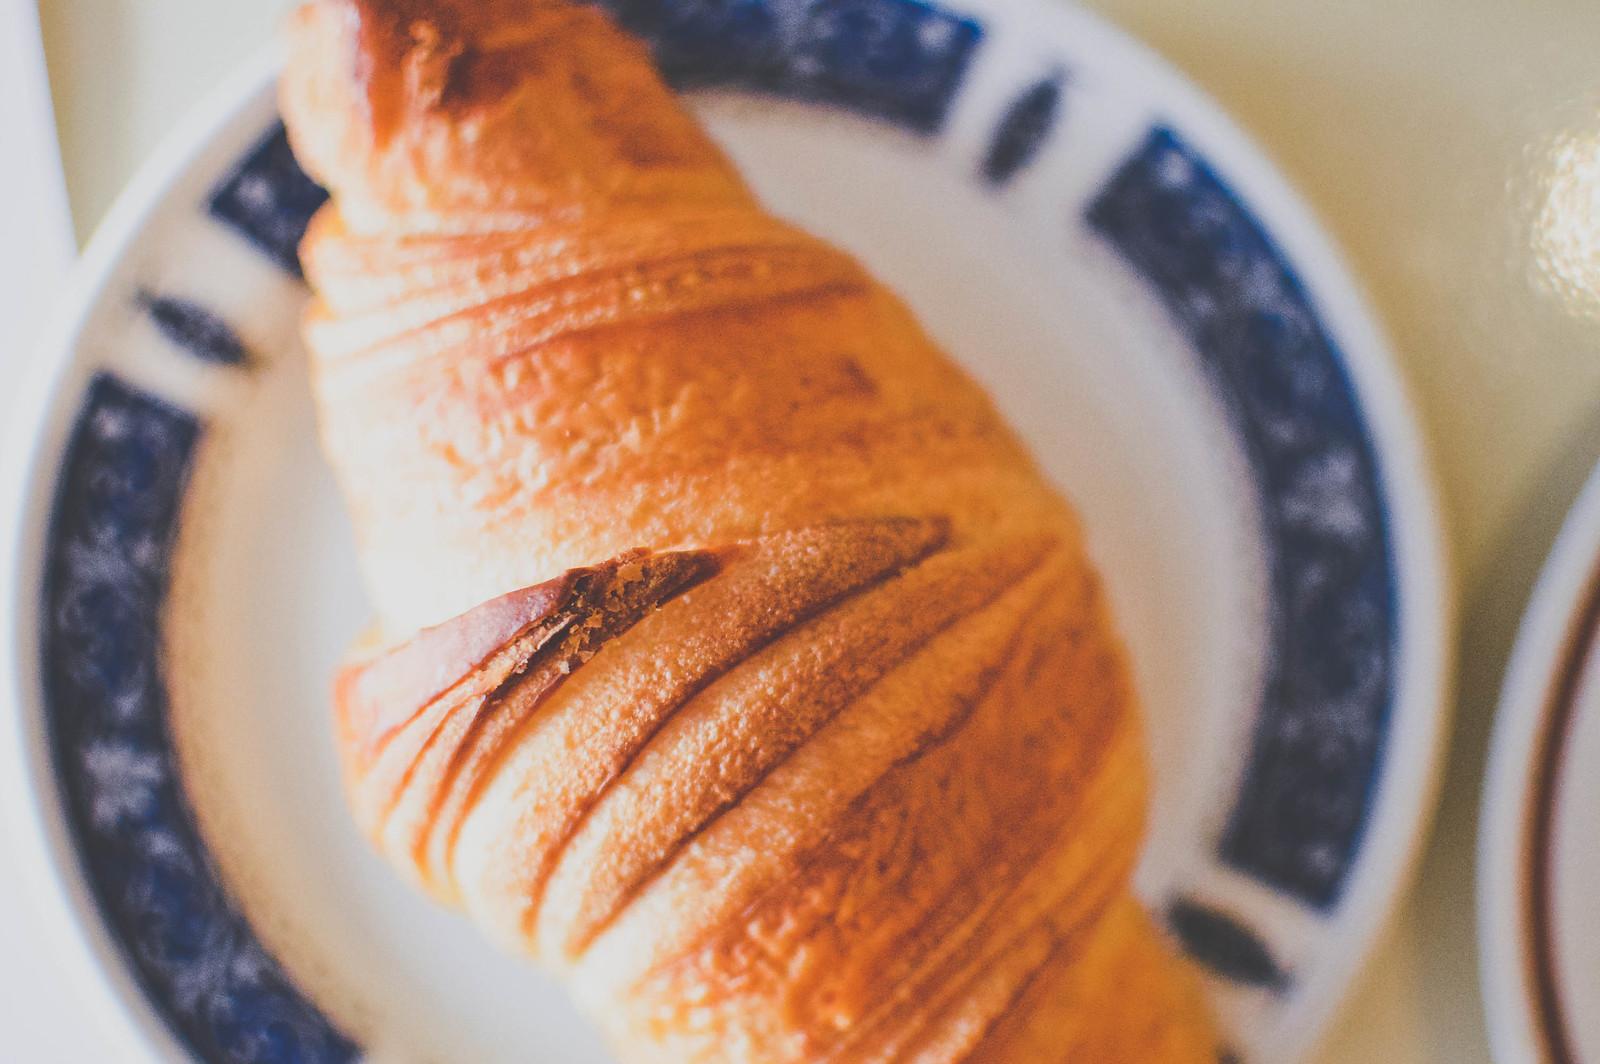 Tiong Bahru Bakery Croissant